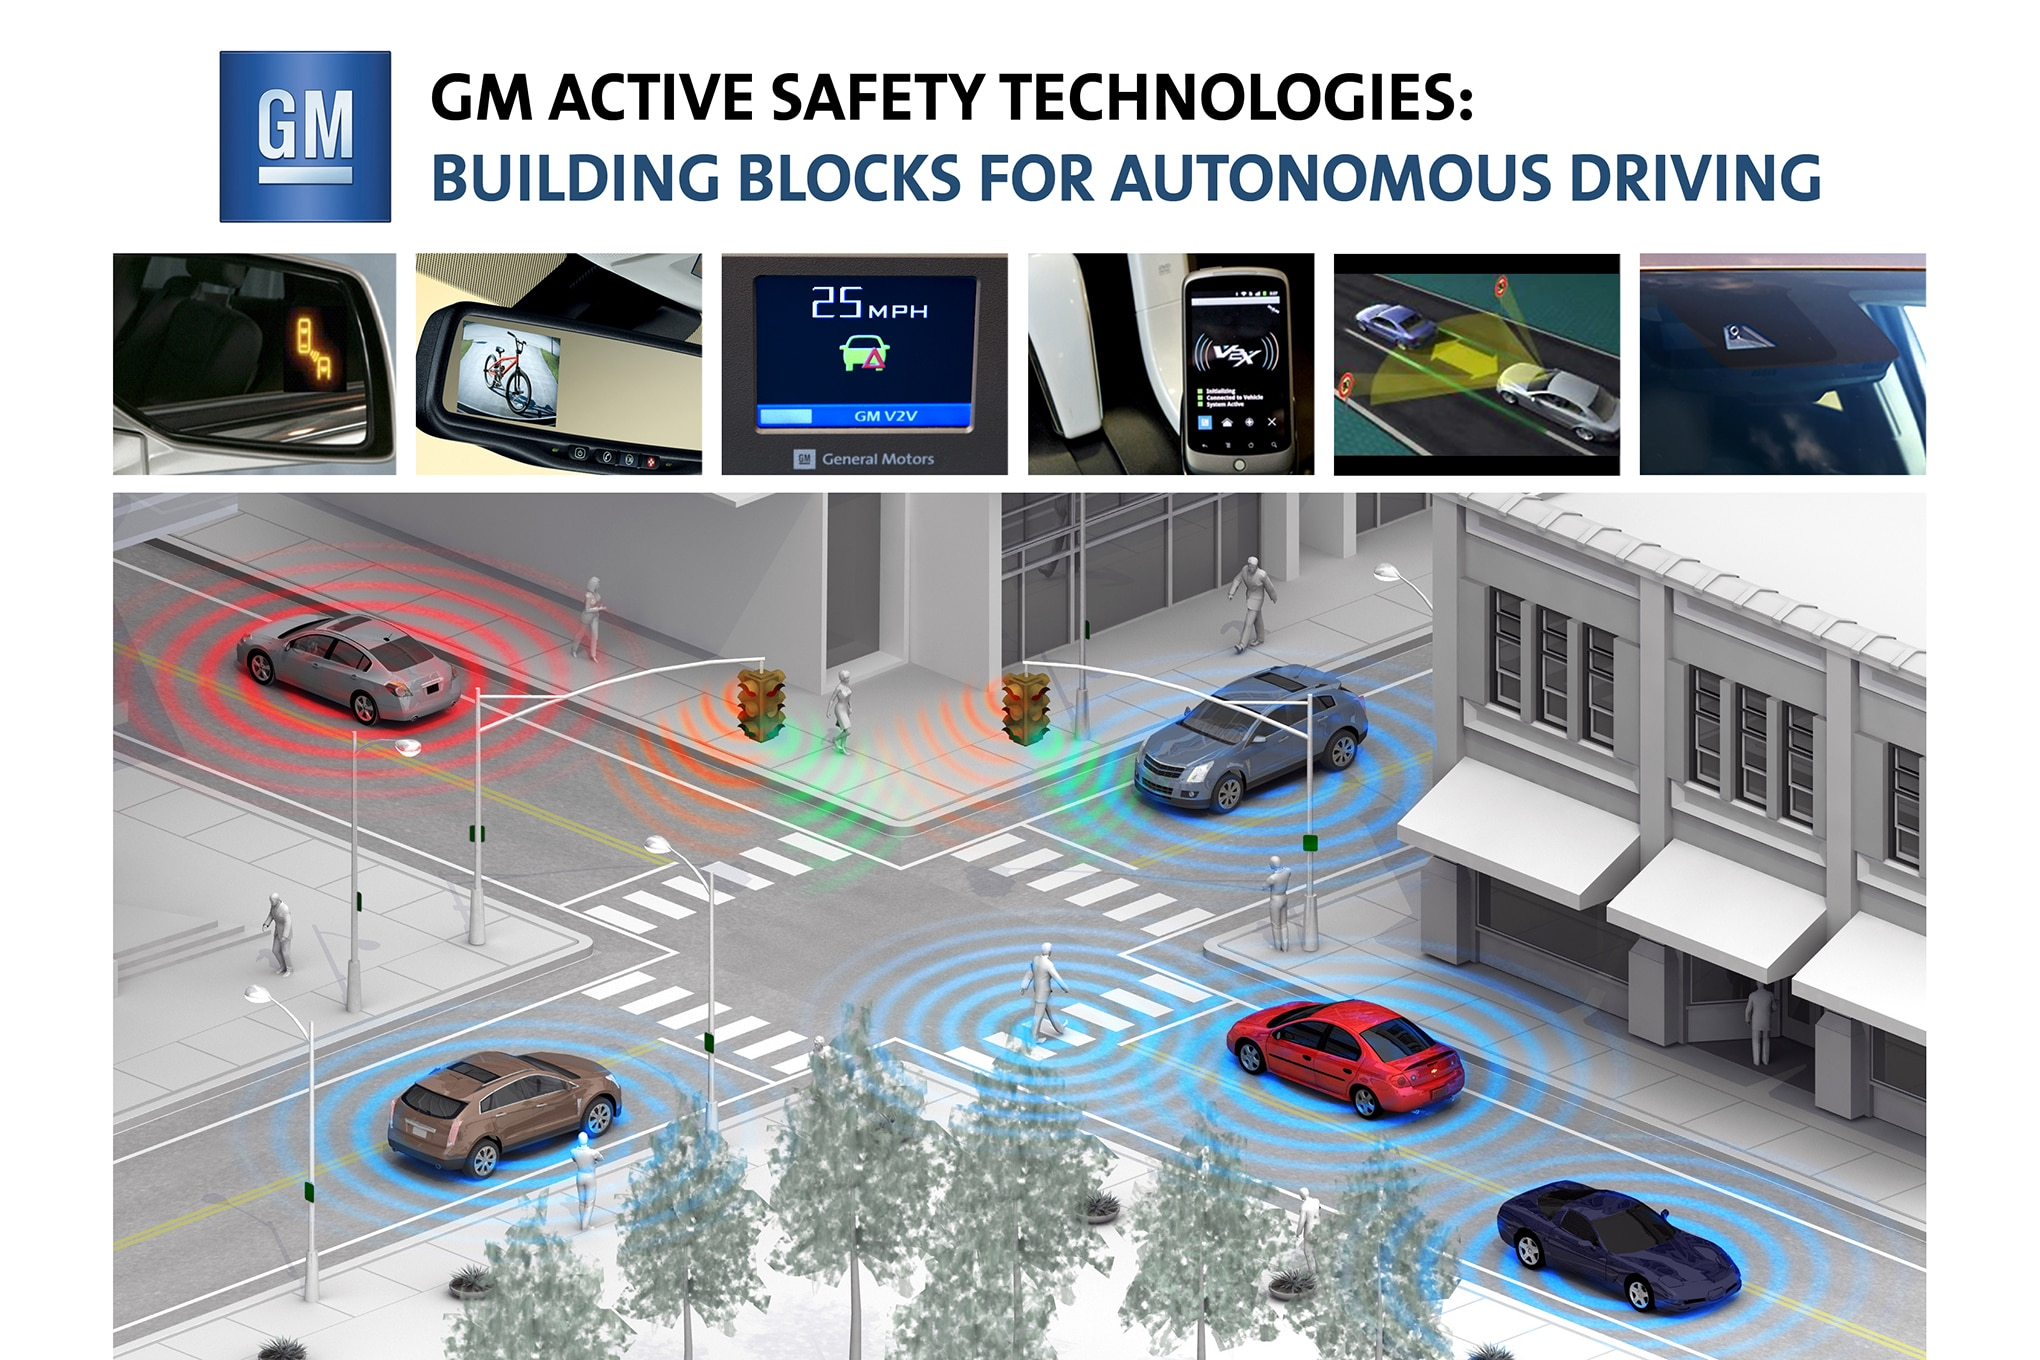 005 auto news jp jeep gm autonomous self driving high tech